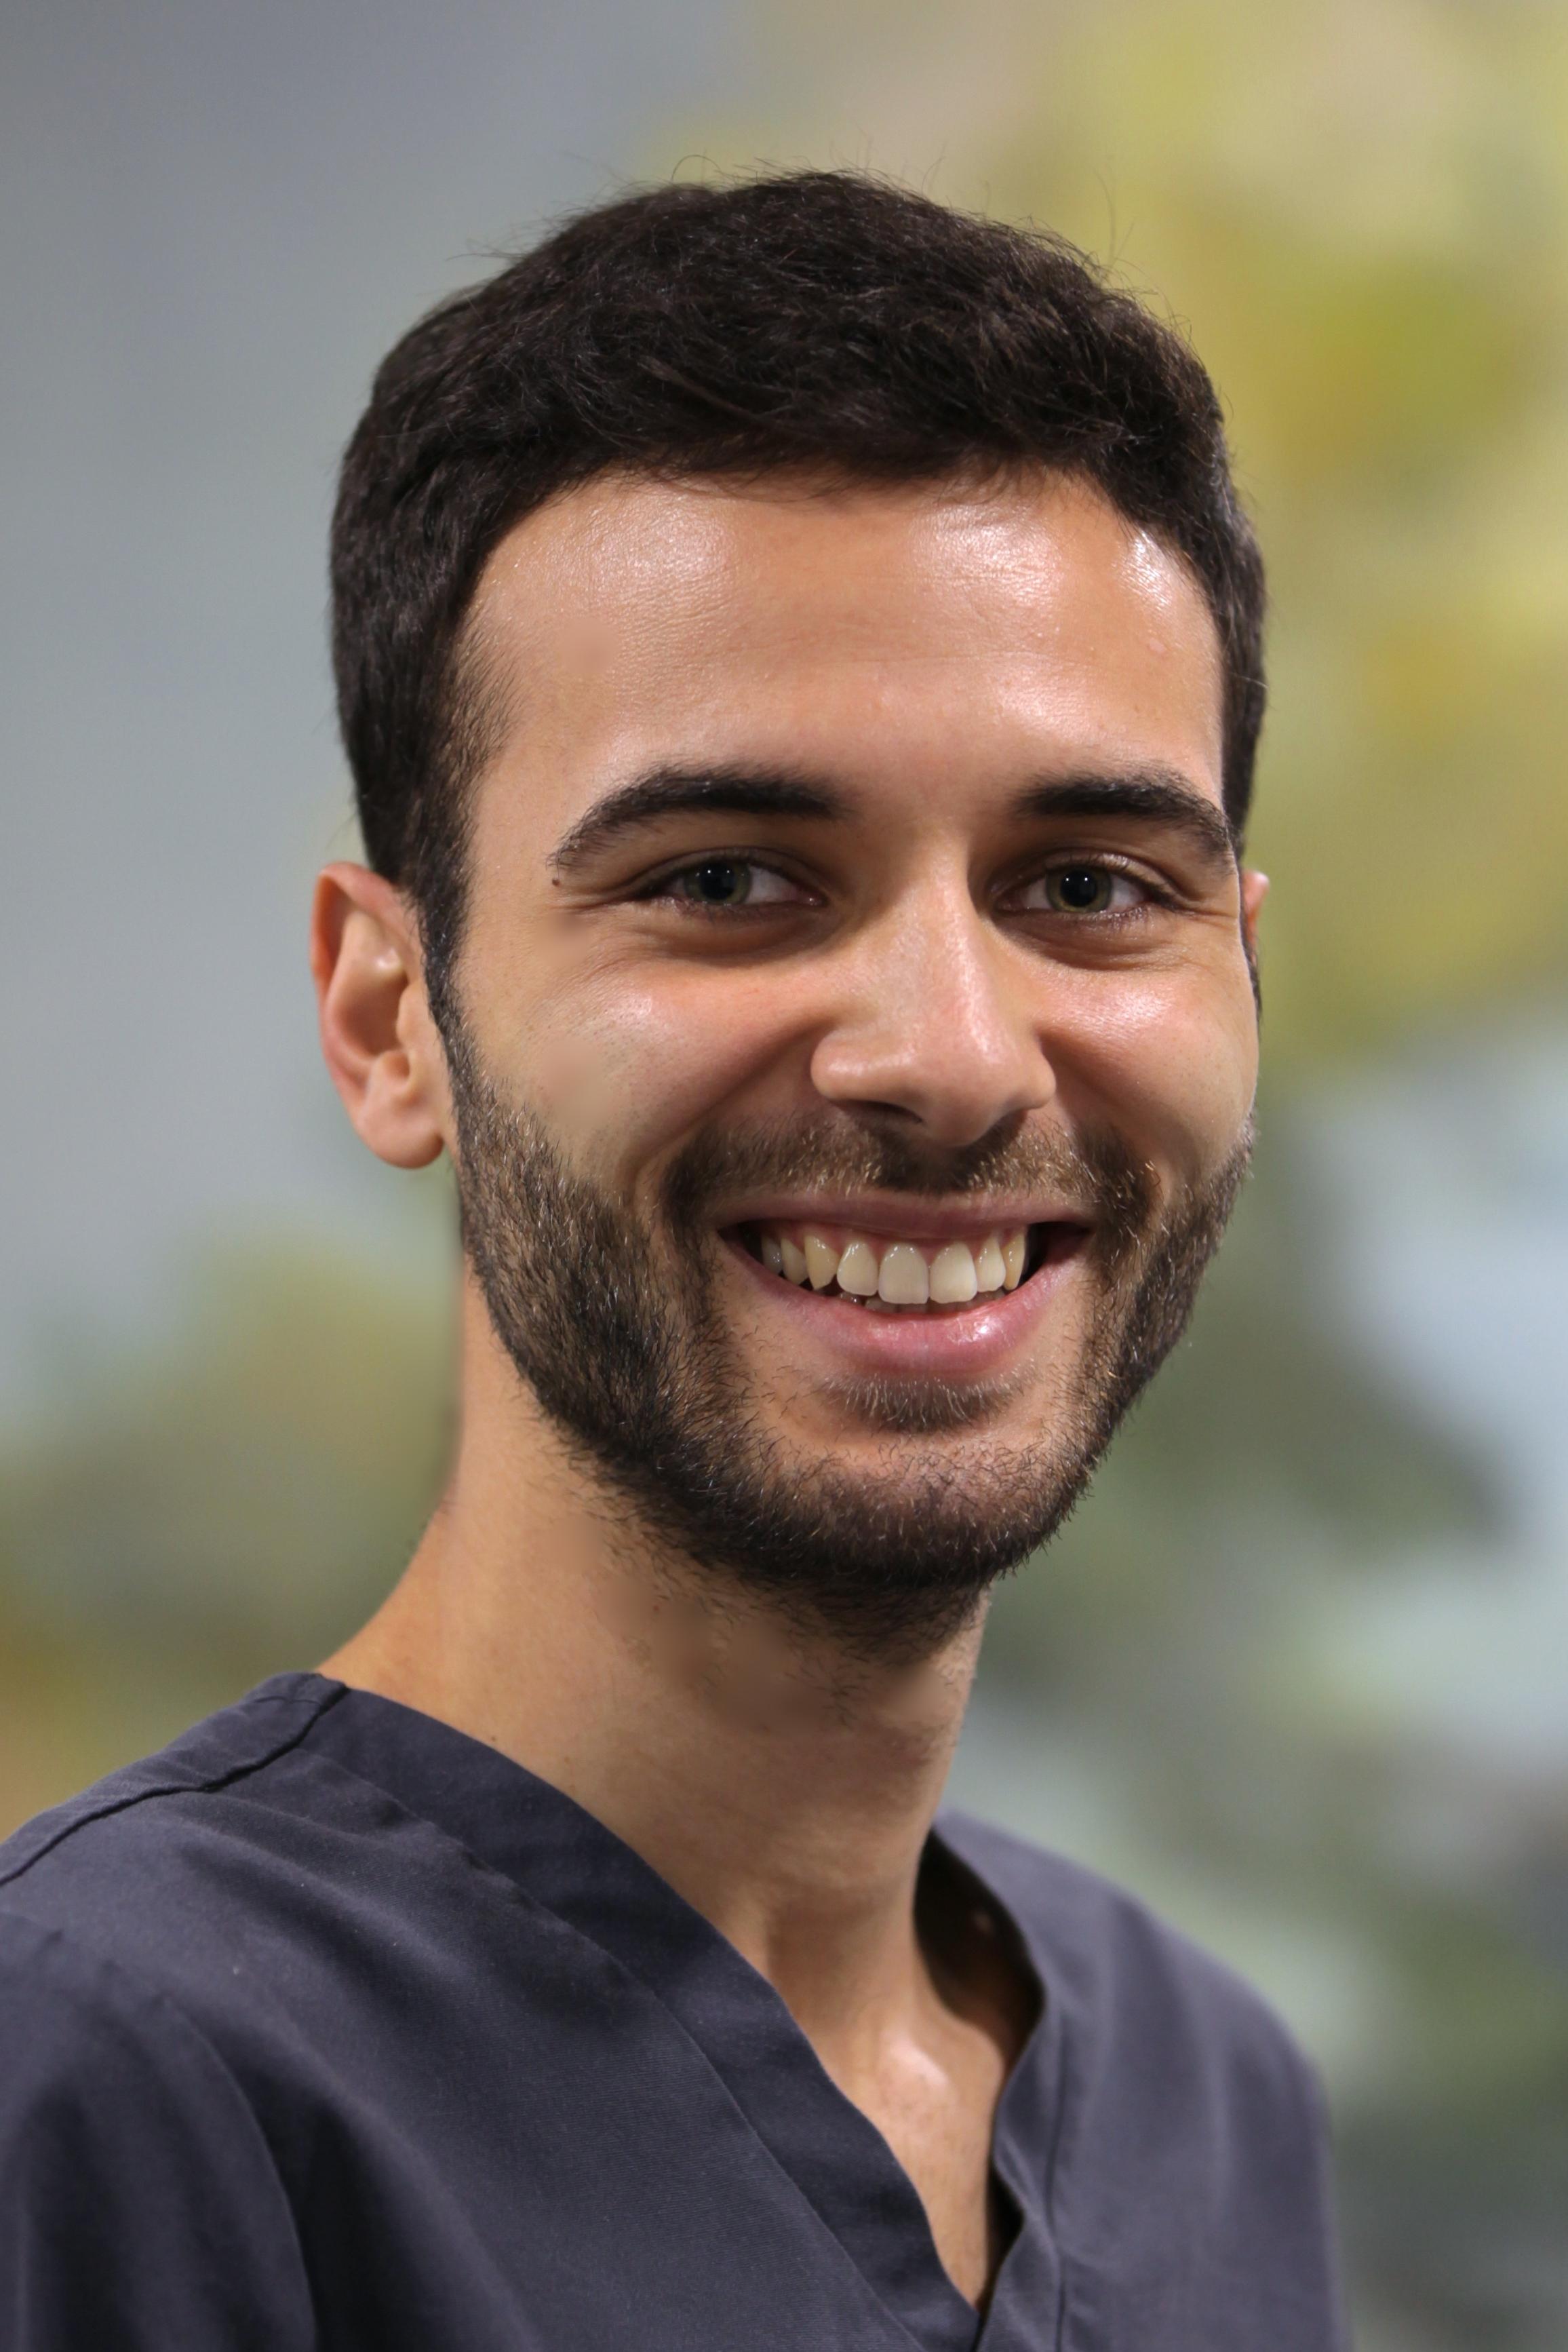 Stefano MasillaDentist - stefano-masilla